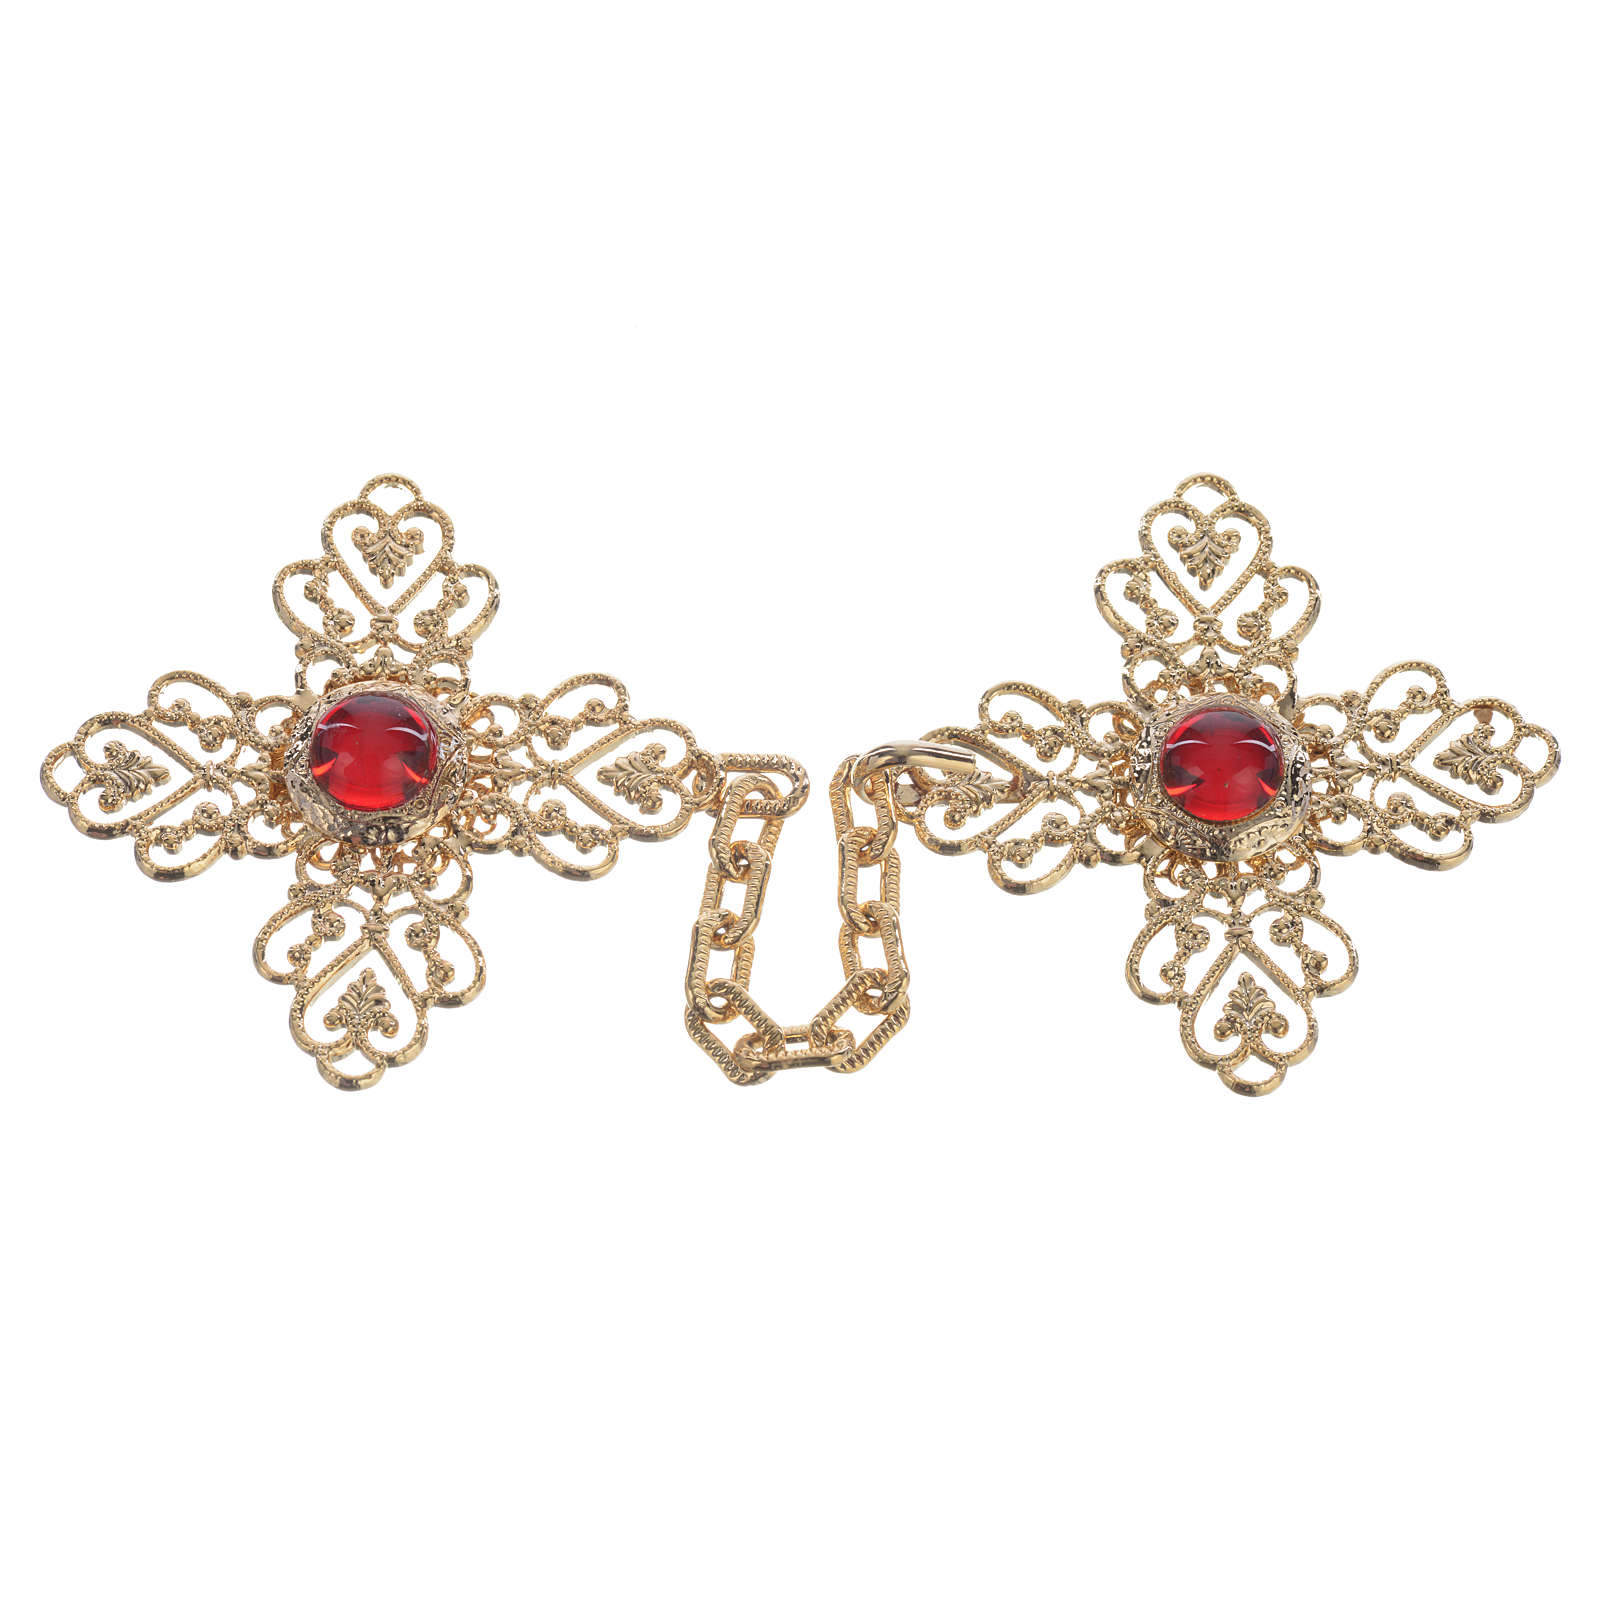 Broche pluvial cruz dorada piedra roja 4